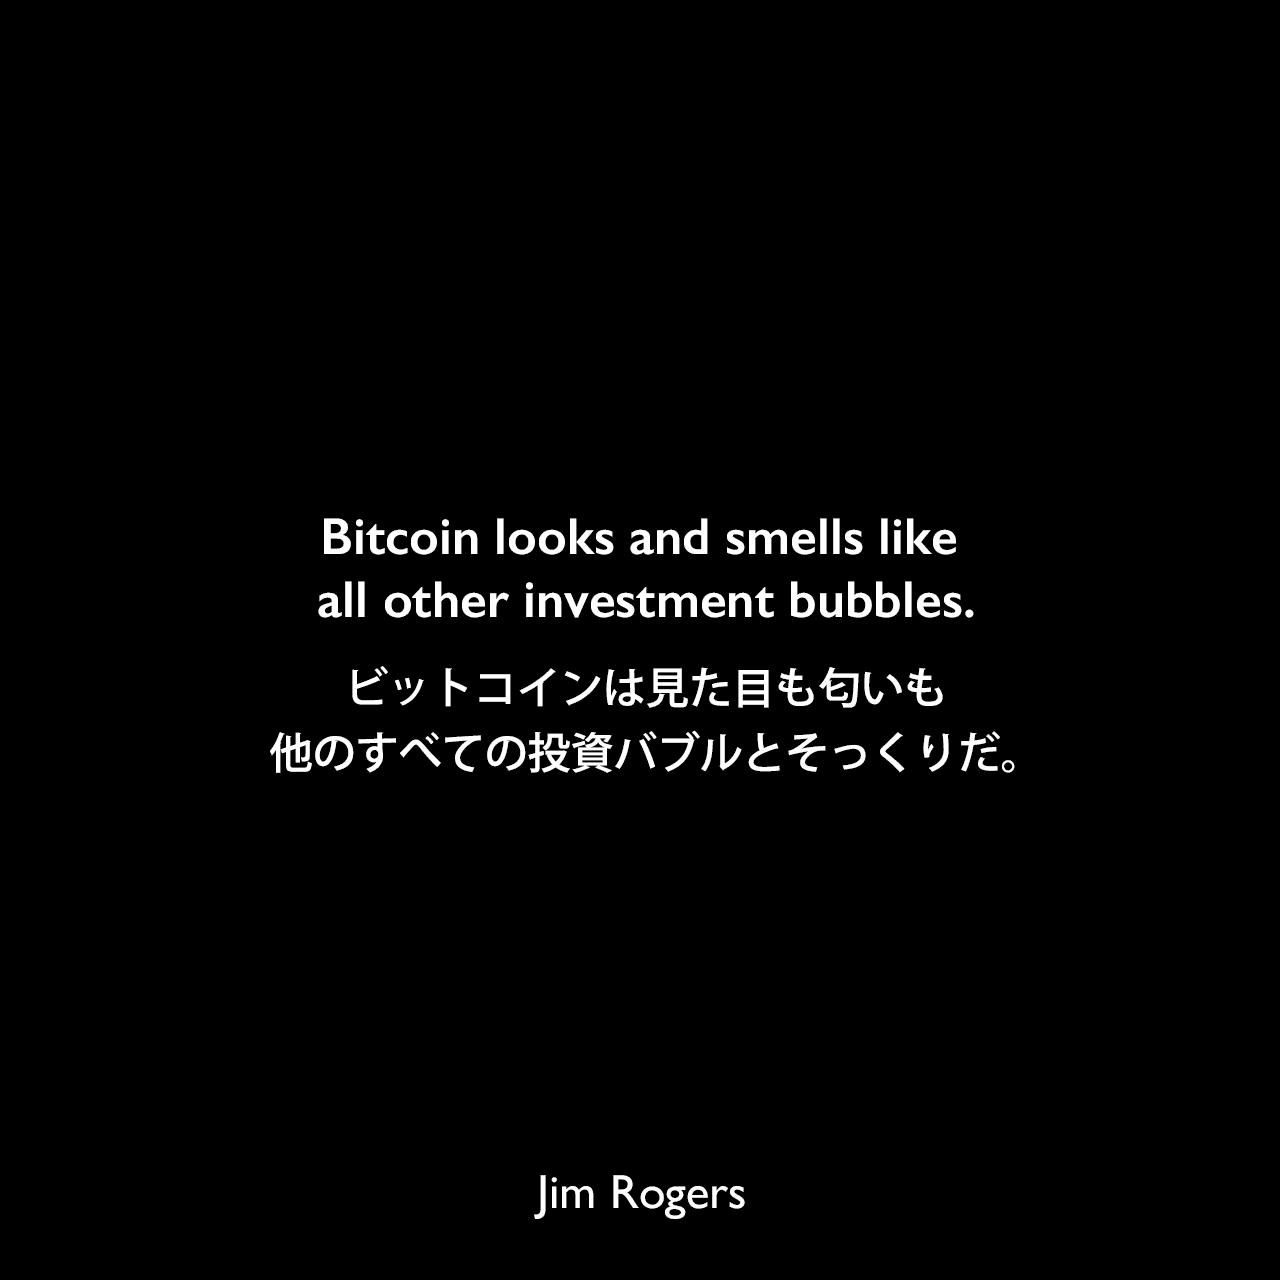 Bitcoin looks and smells like all other investment bubbles.ビットコインは見た目も匂いも他のすべての投資バブルとそっくりだ。Jim Rogers